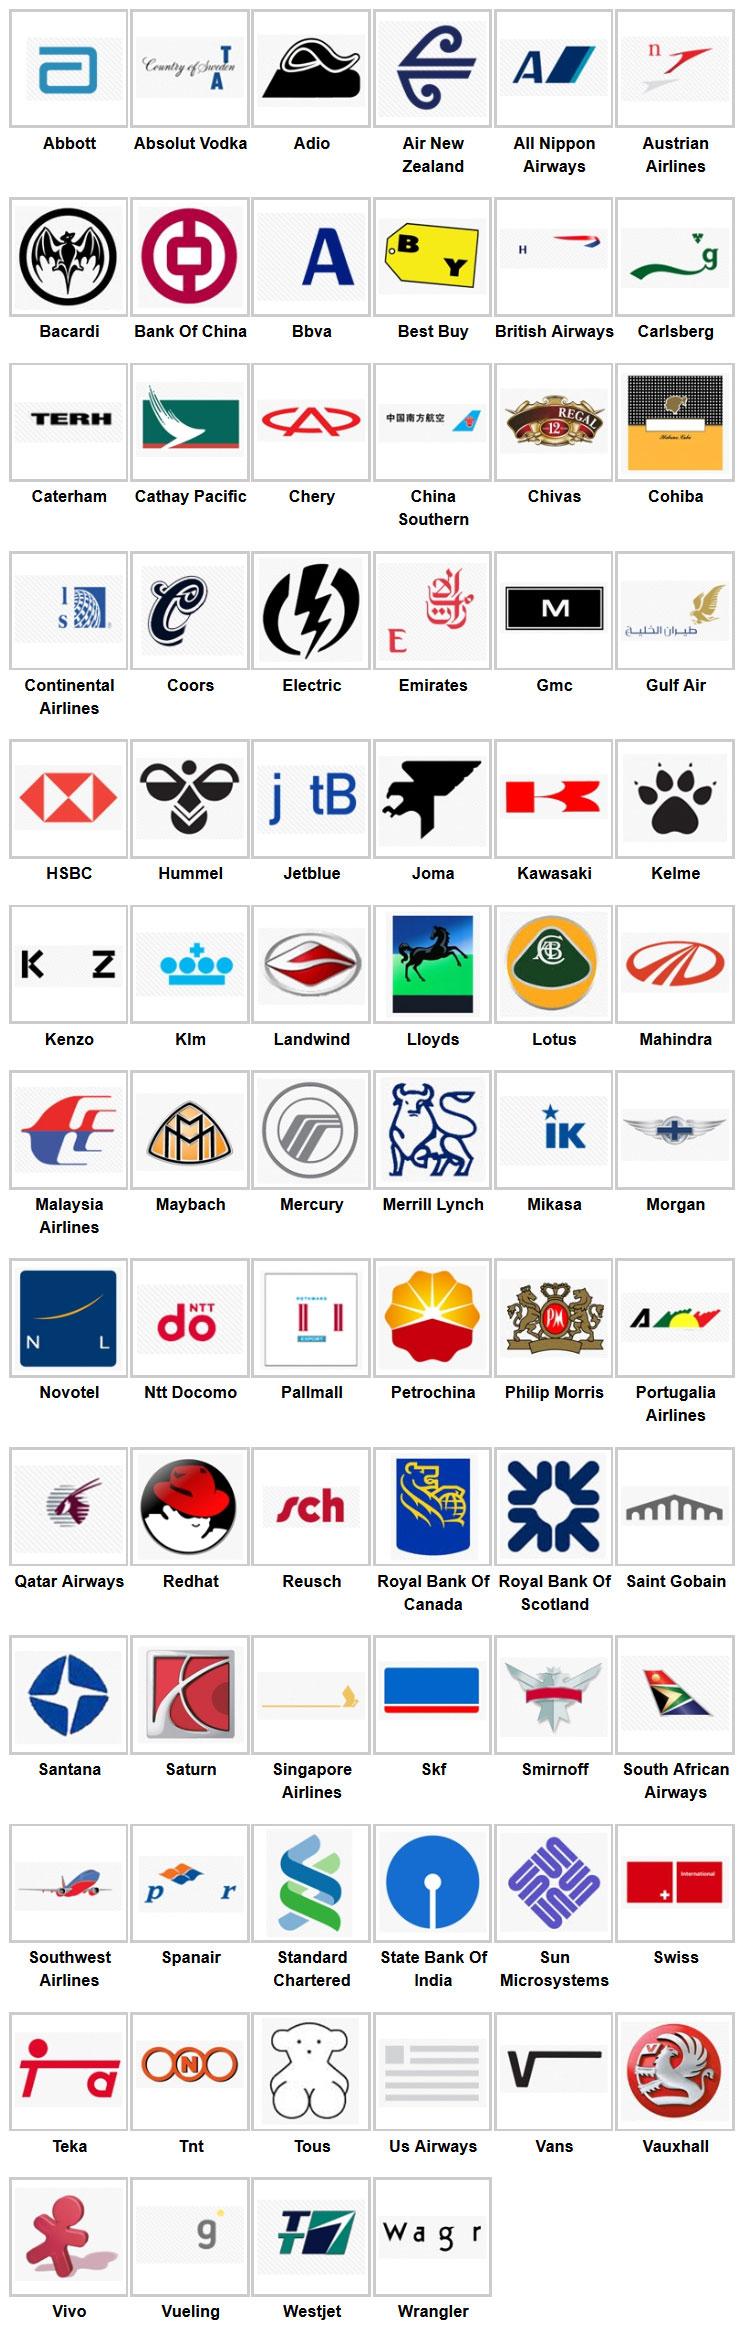 Restaurant logos quiz restaurant logo icon quiz by - Logo Quiz8